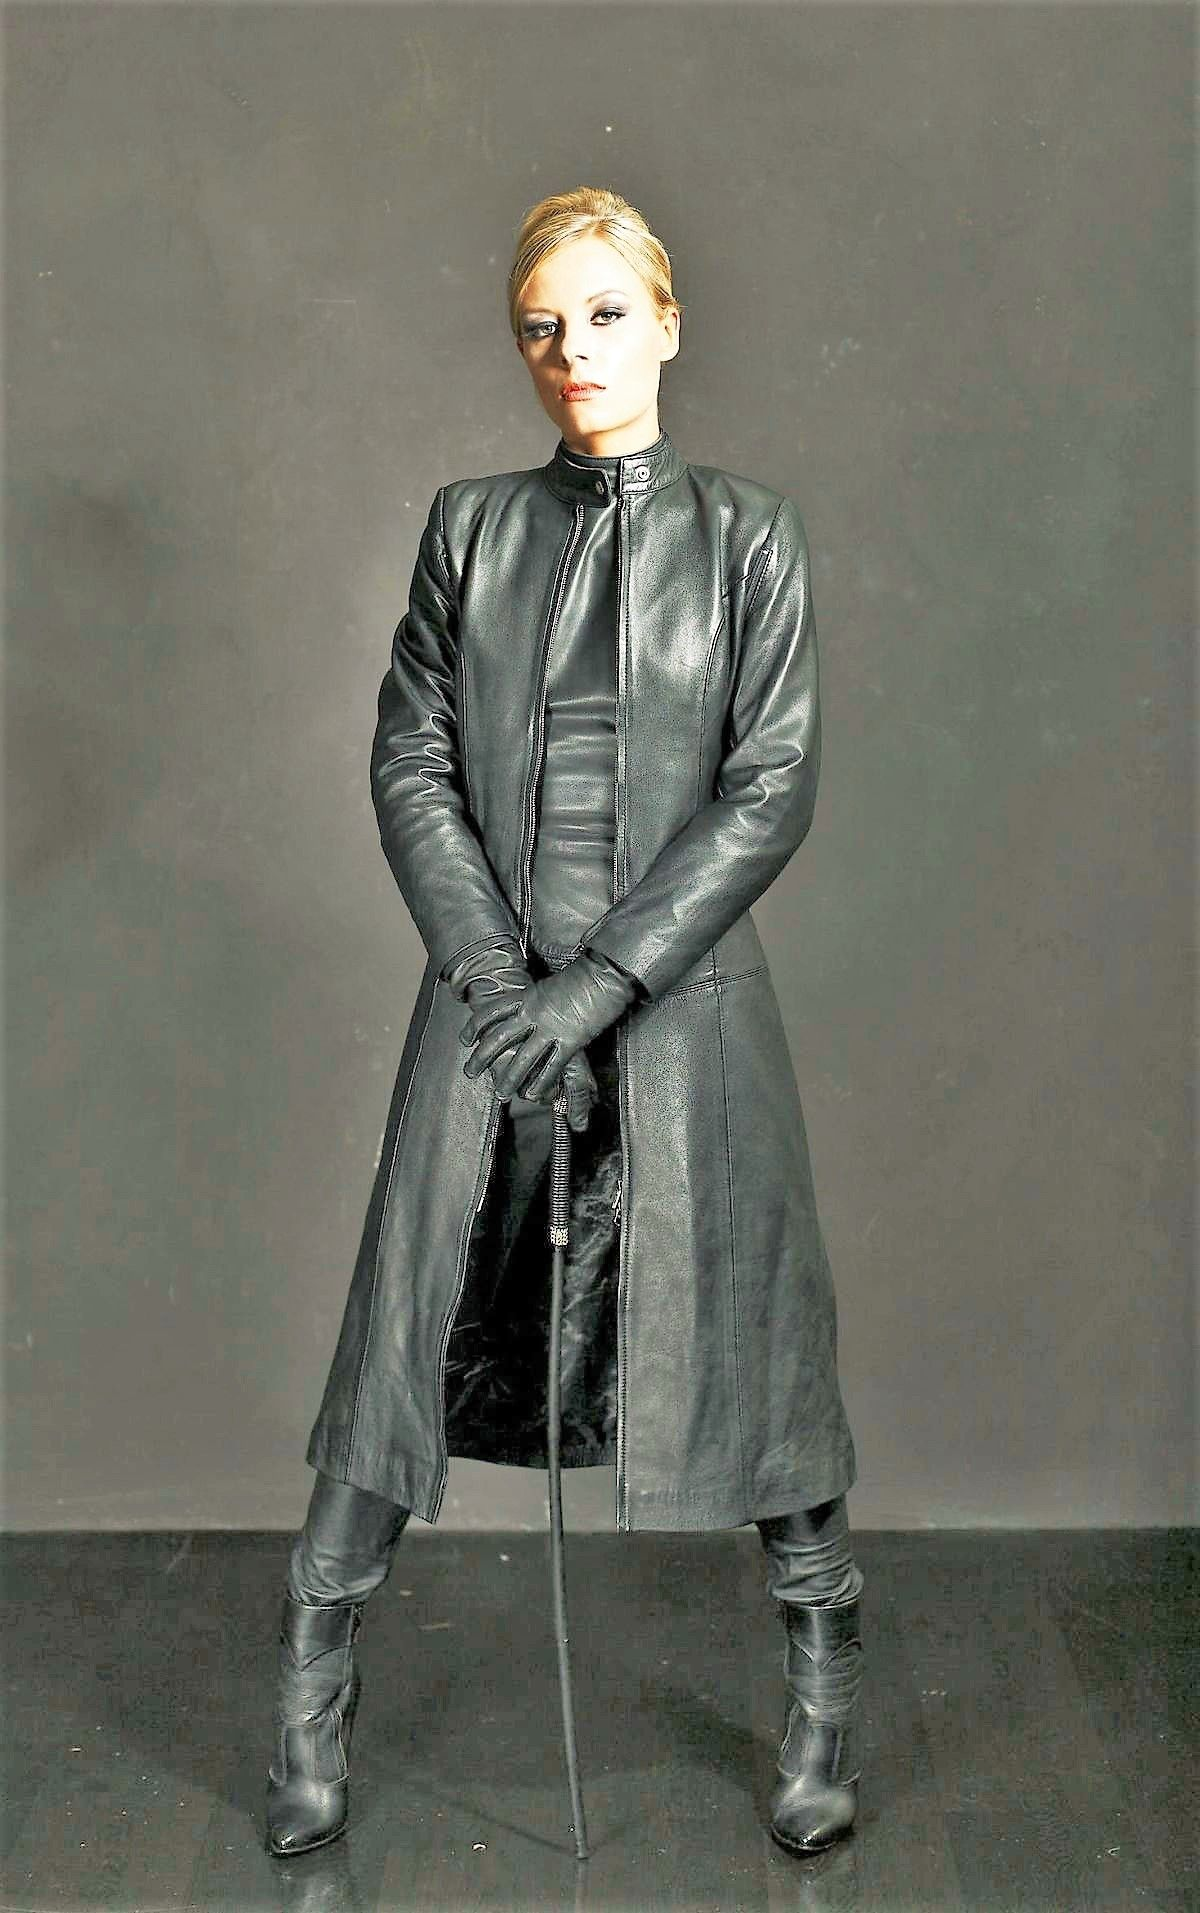 Komplett In Leder : komplett in leder best leathersuits and dresses leder ~ A.2002-acura-tl-radio.info Haus und Dekorationen